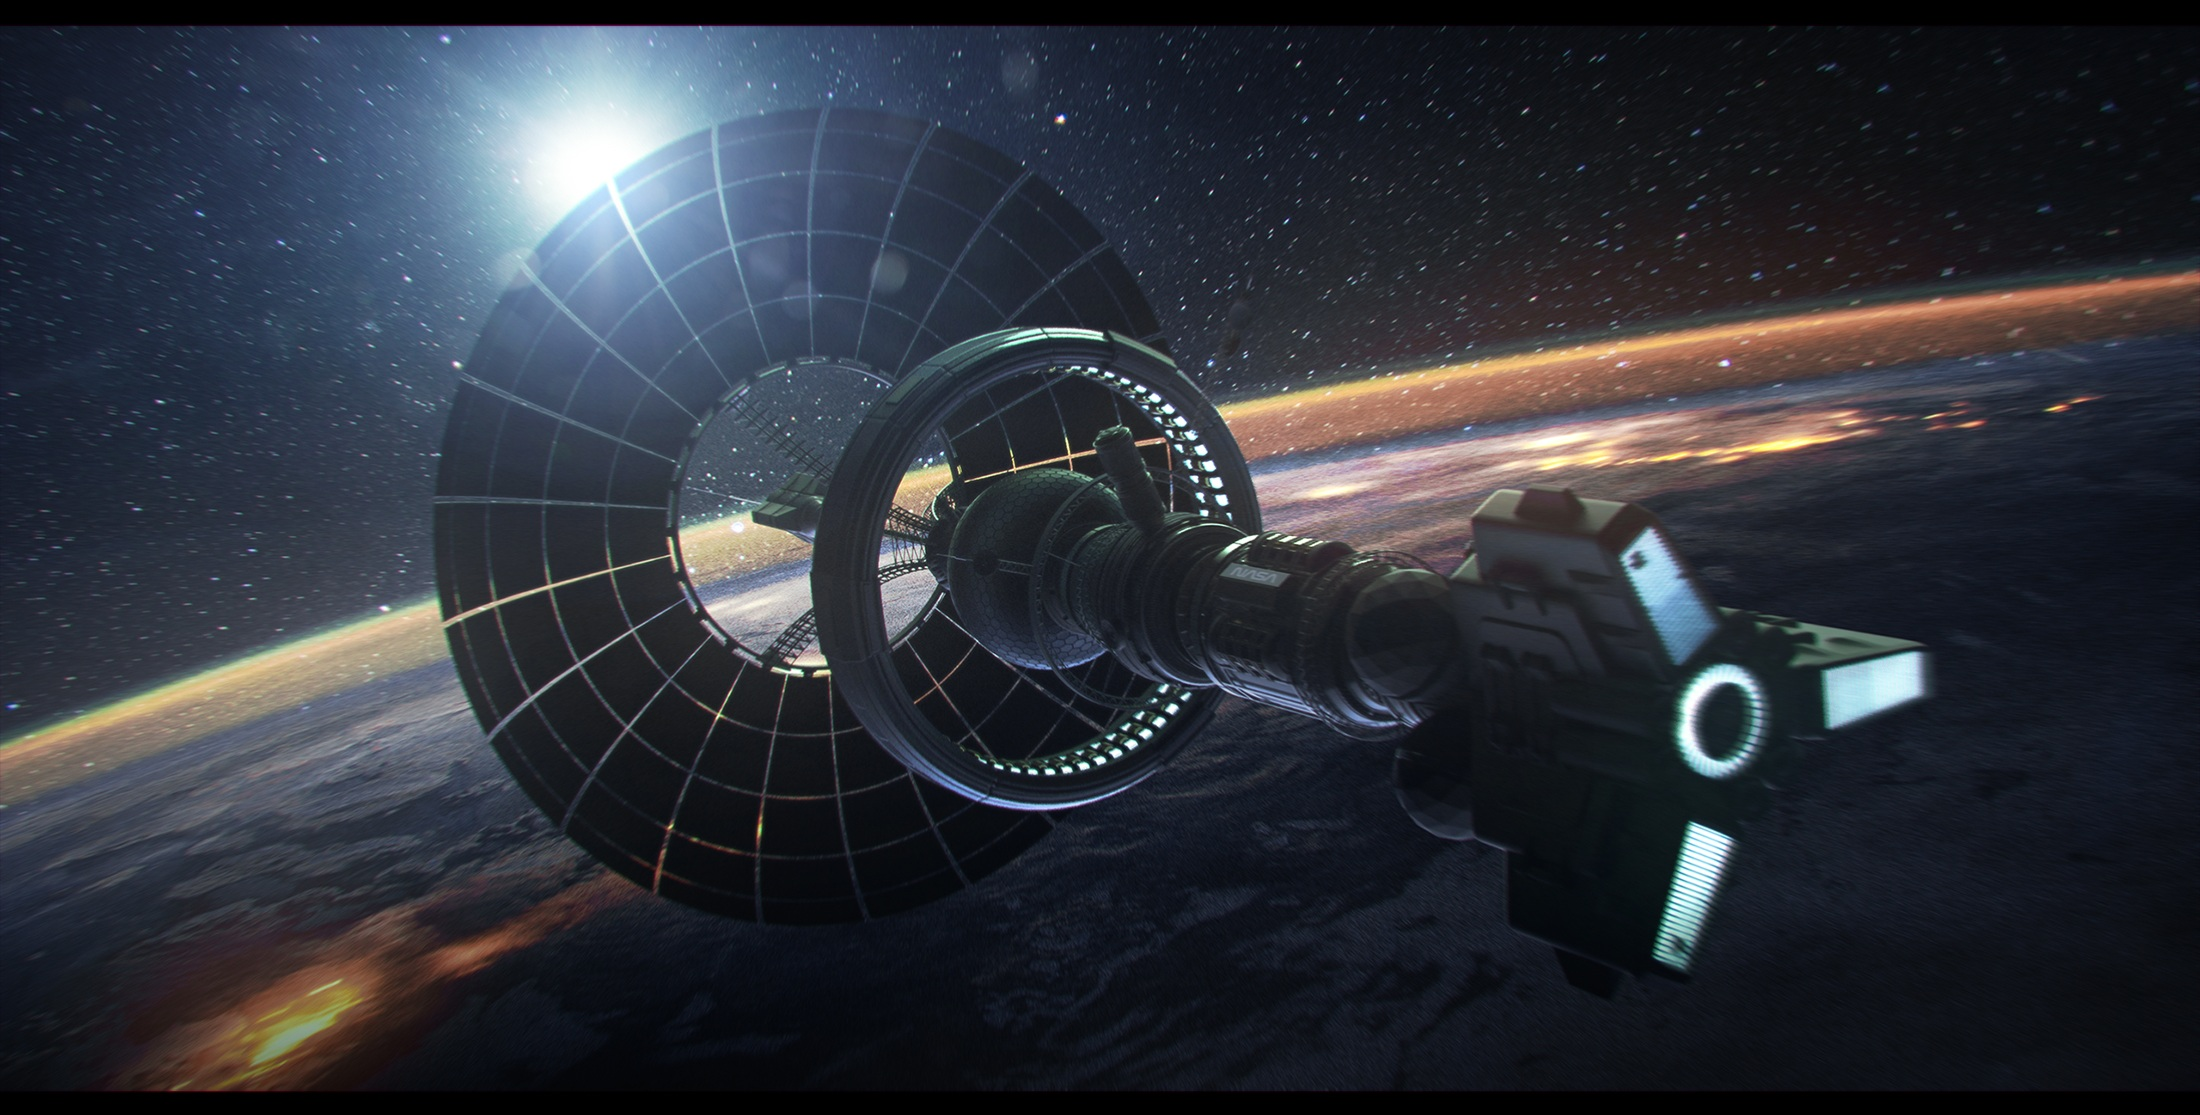 Space+ship_01.jpg